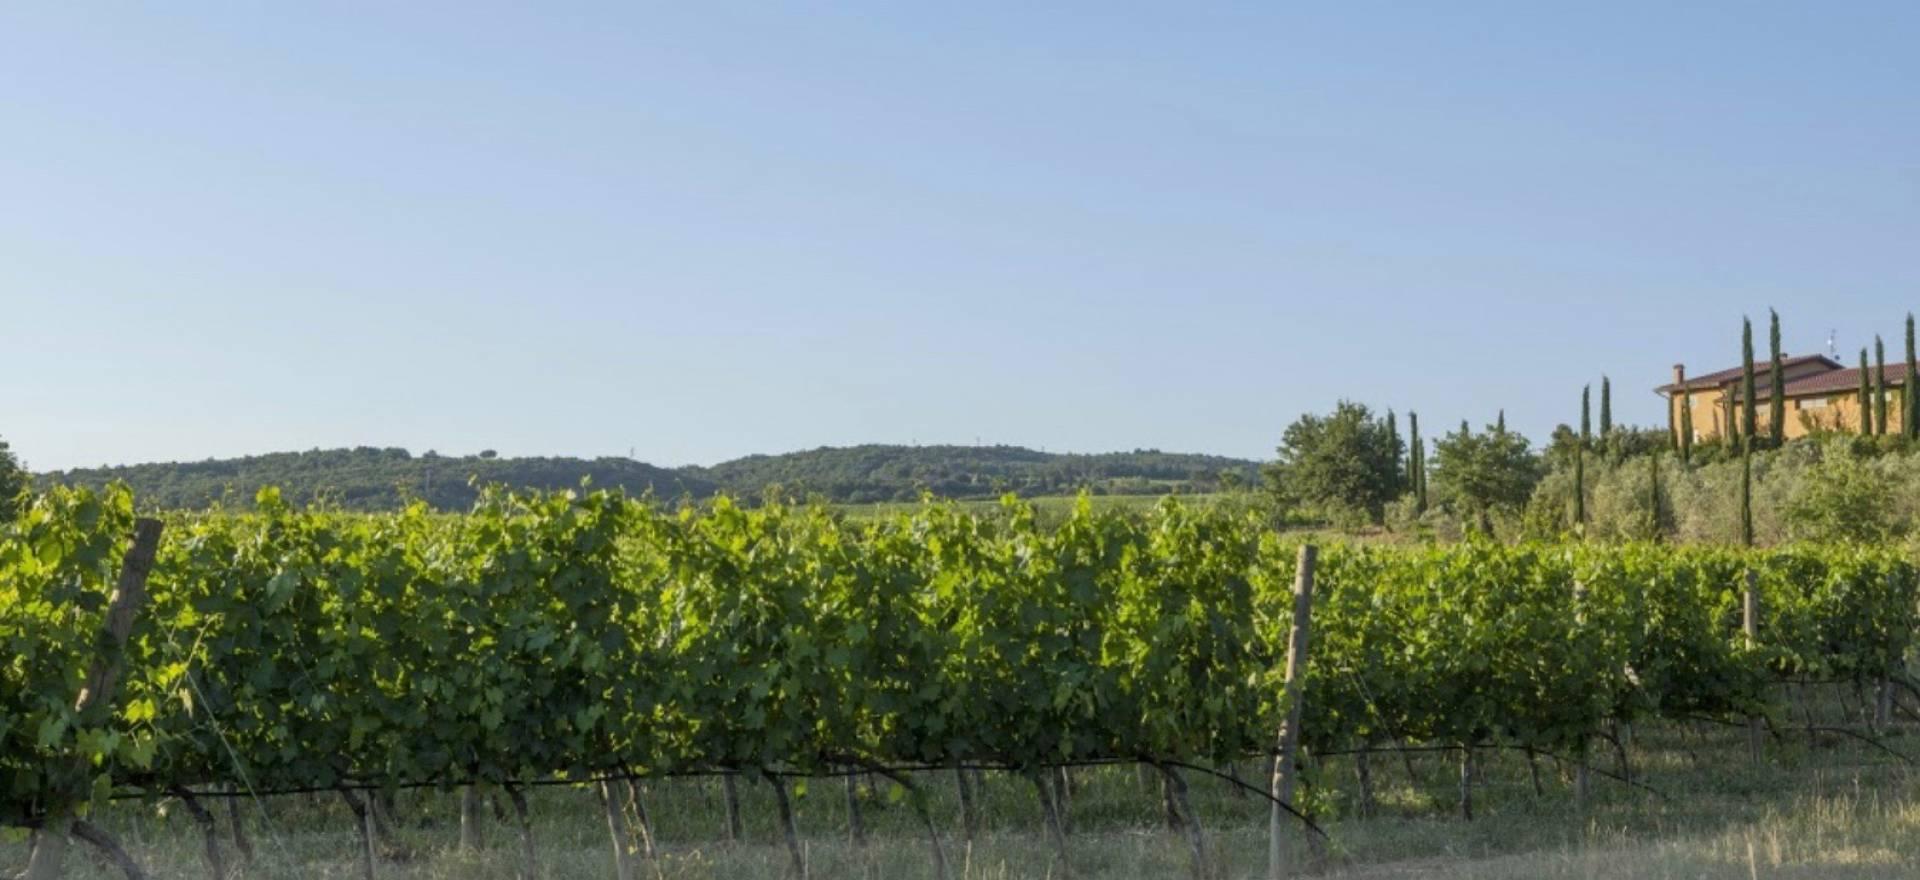 Agriturismo Toscana Bellissimo agriturismo vicino a Montalcino